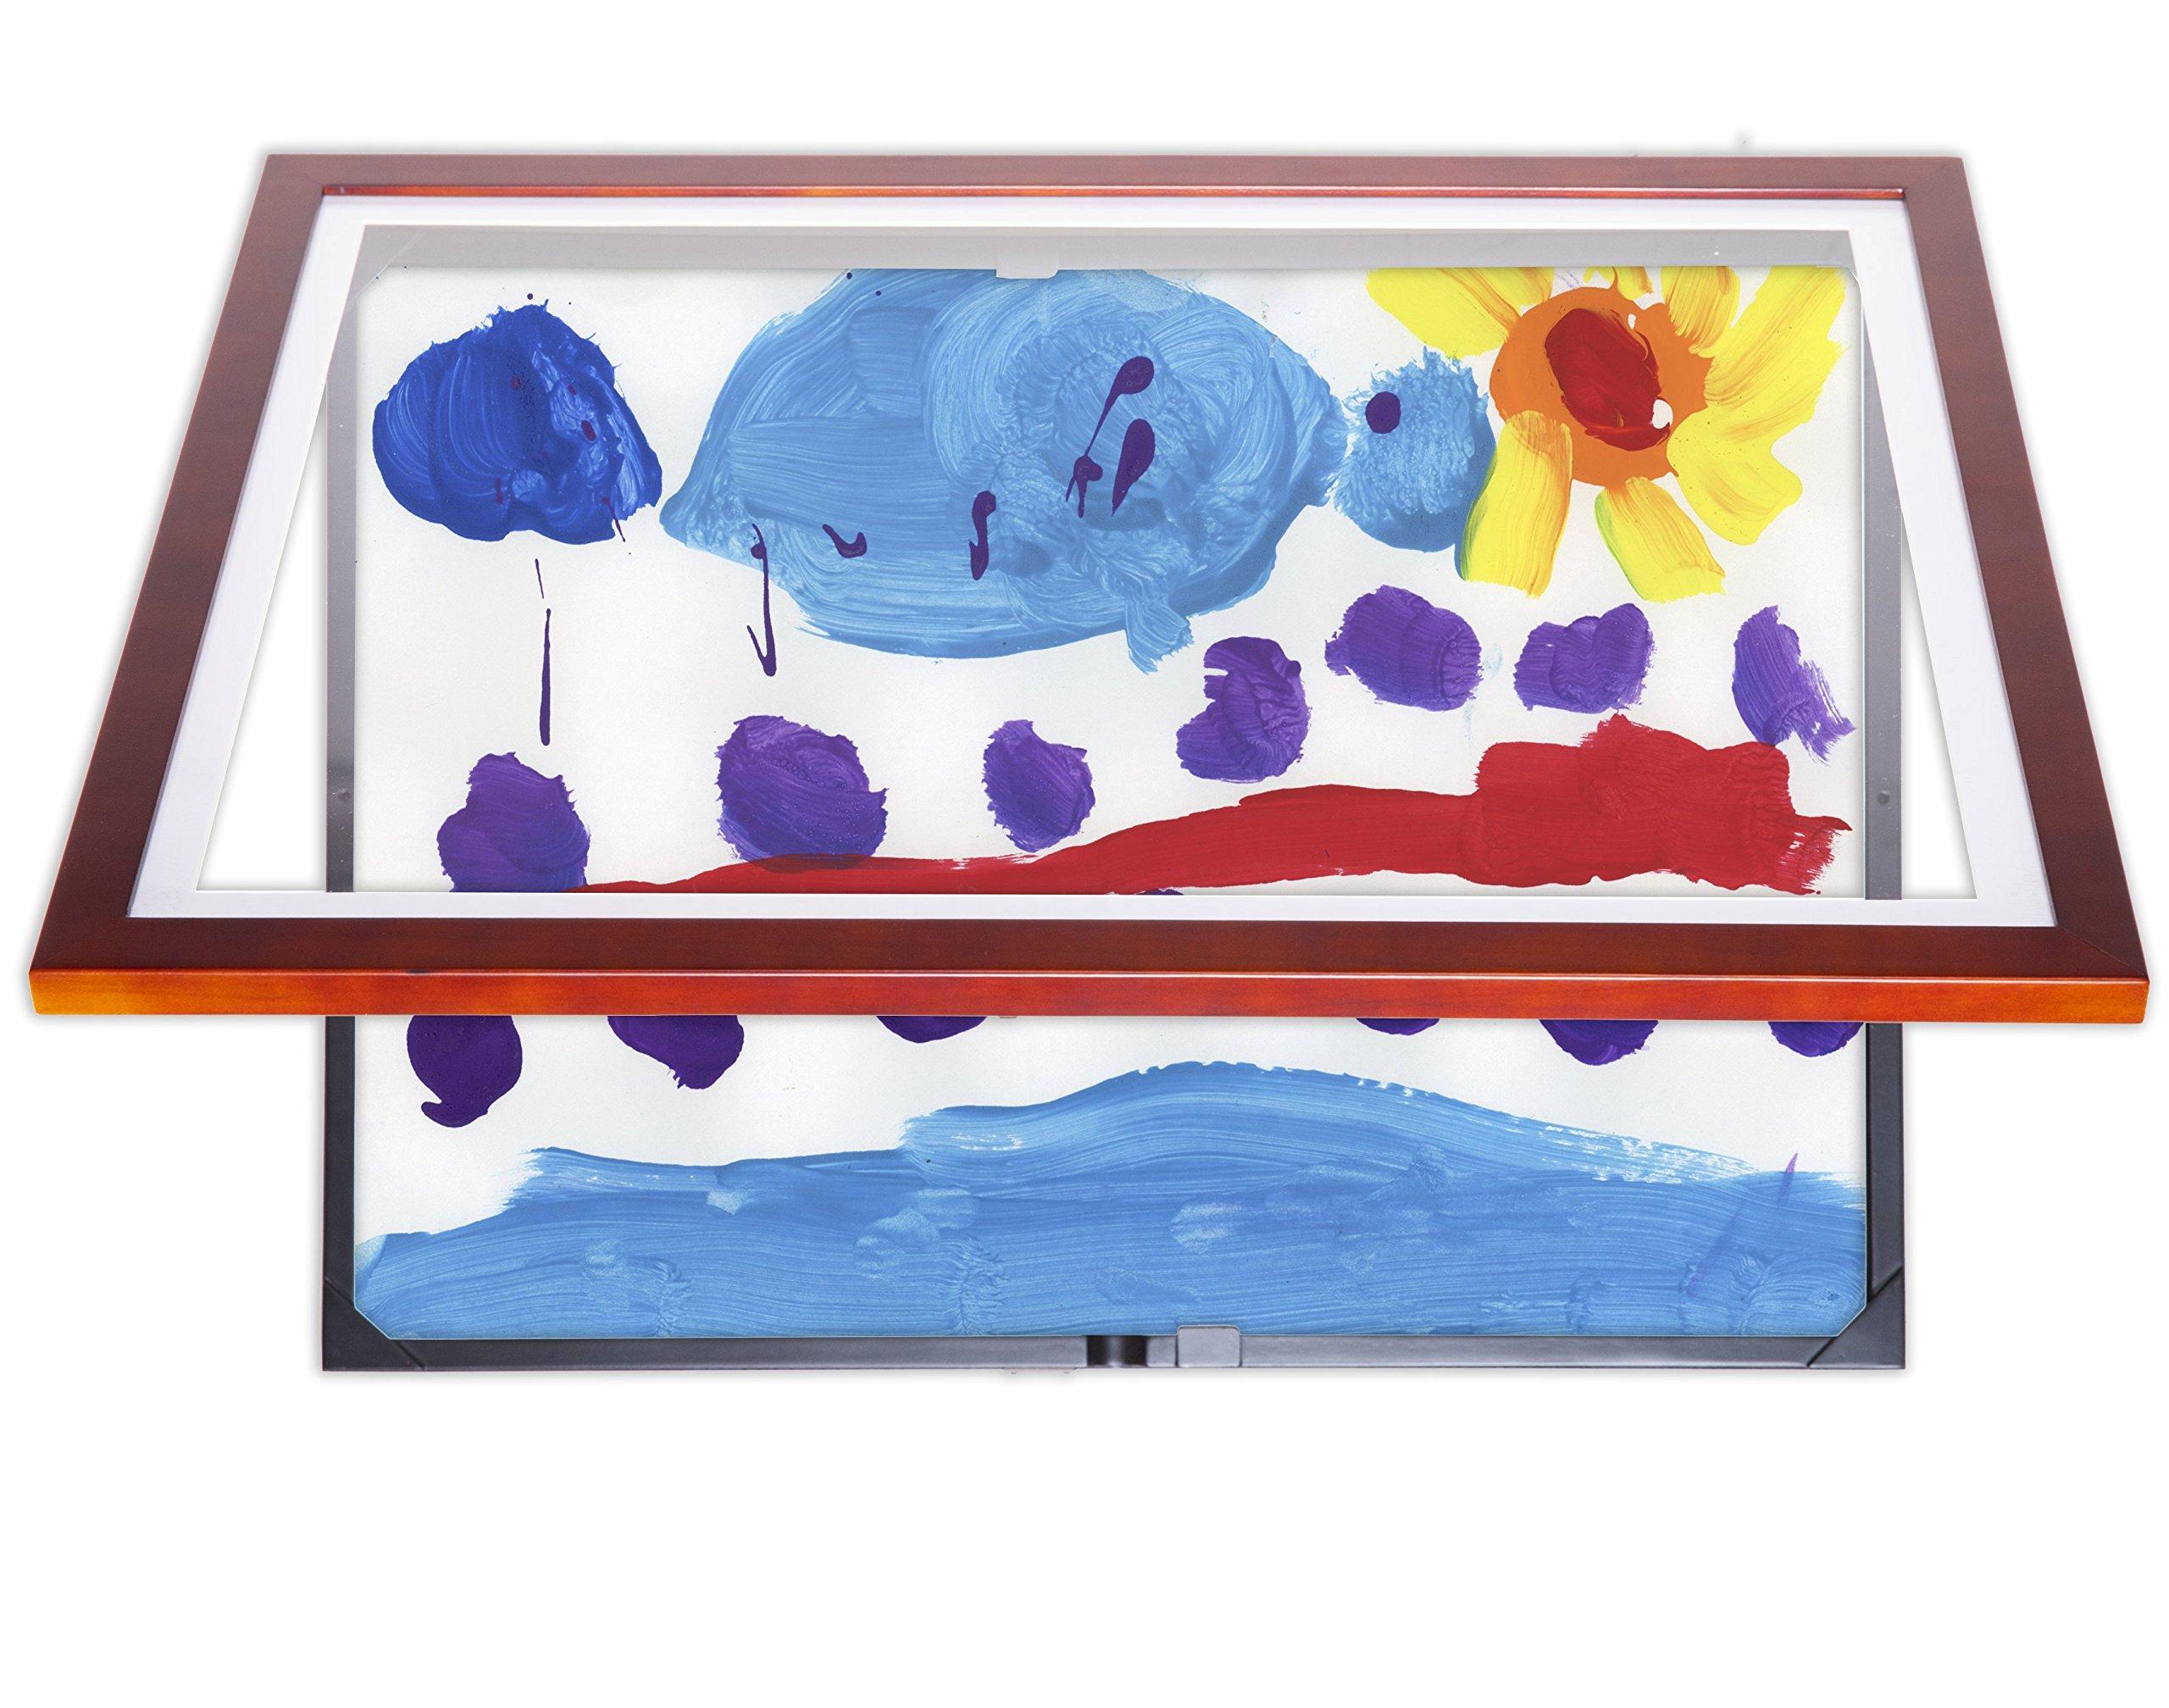 Lil Davinci 18x24 Kids Art Frame (18x24, Cherry)